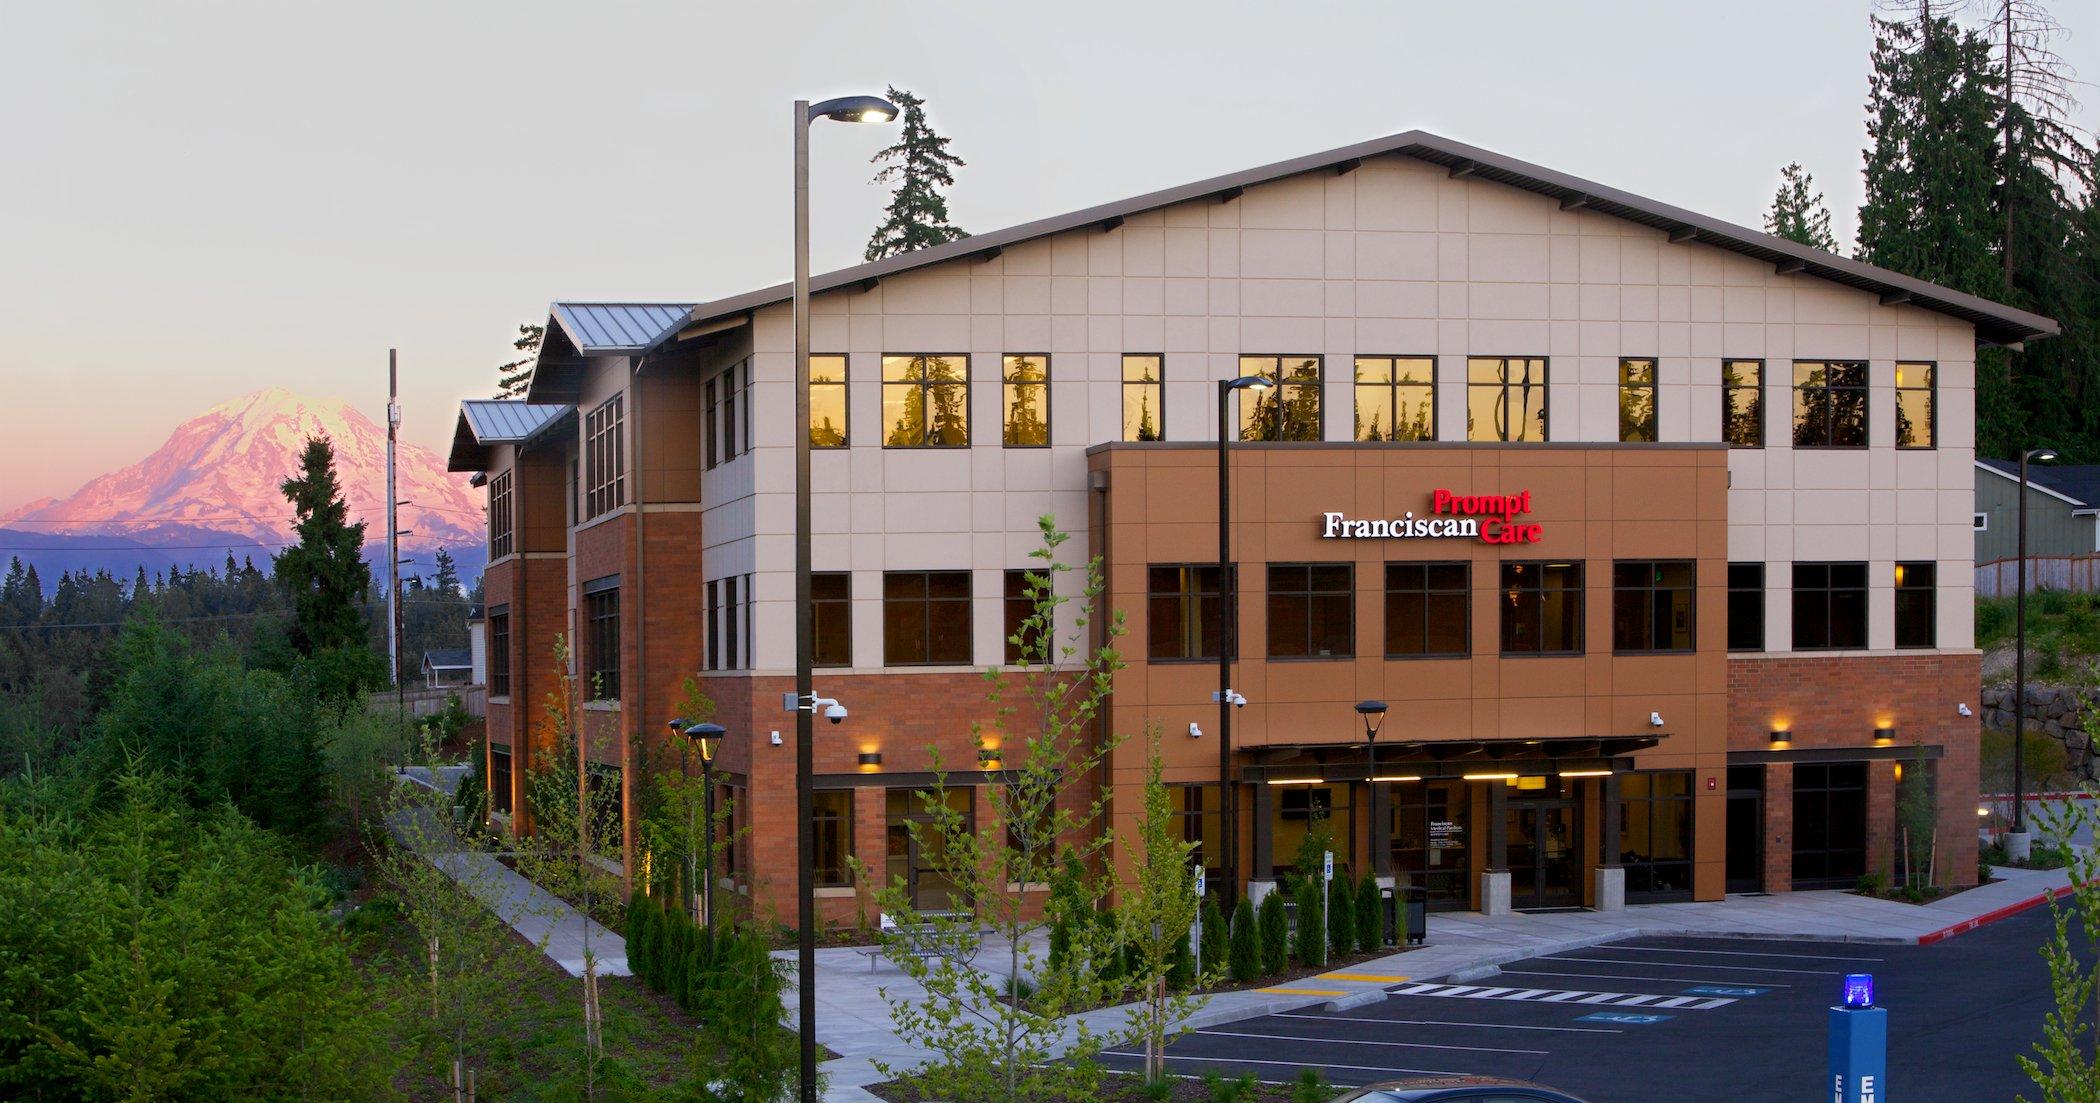 Franciscan Medical Bonney Lake 7-9-13 131P